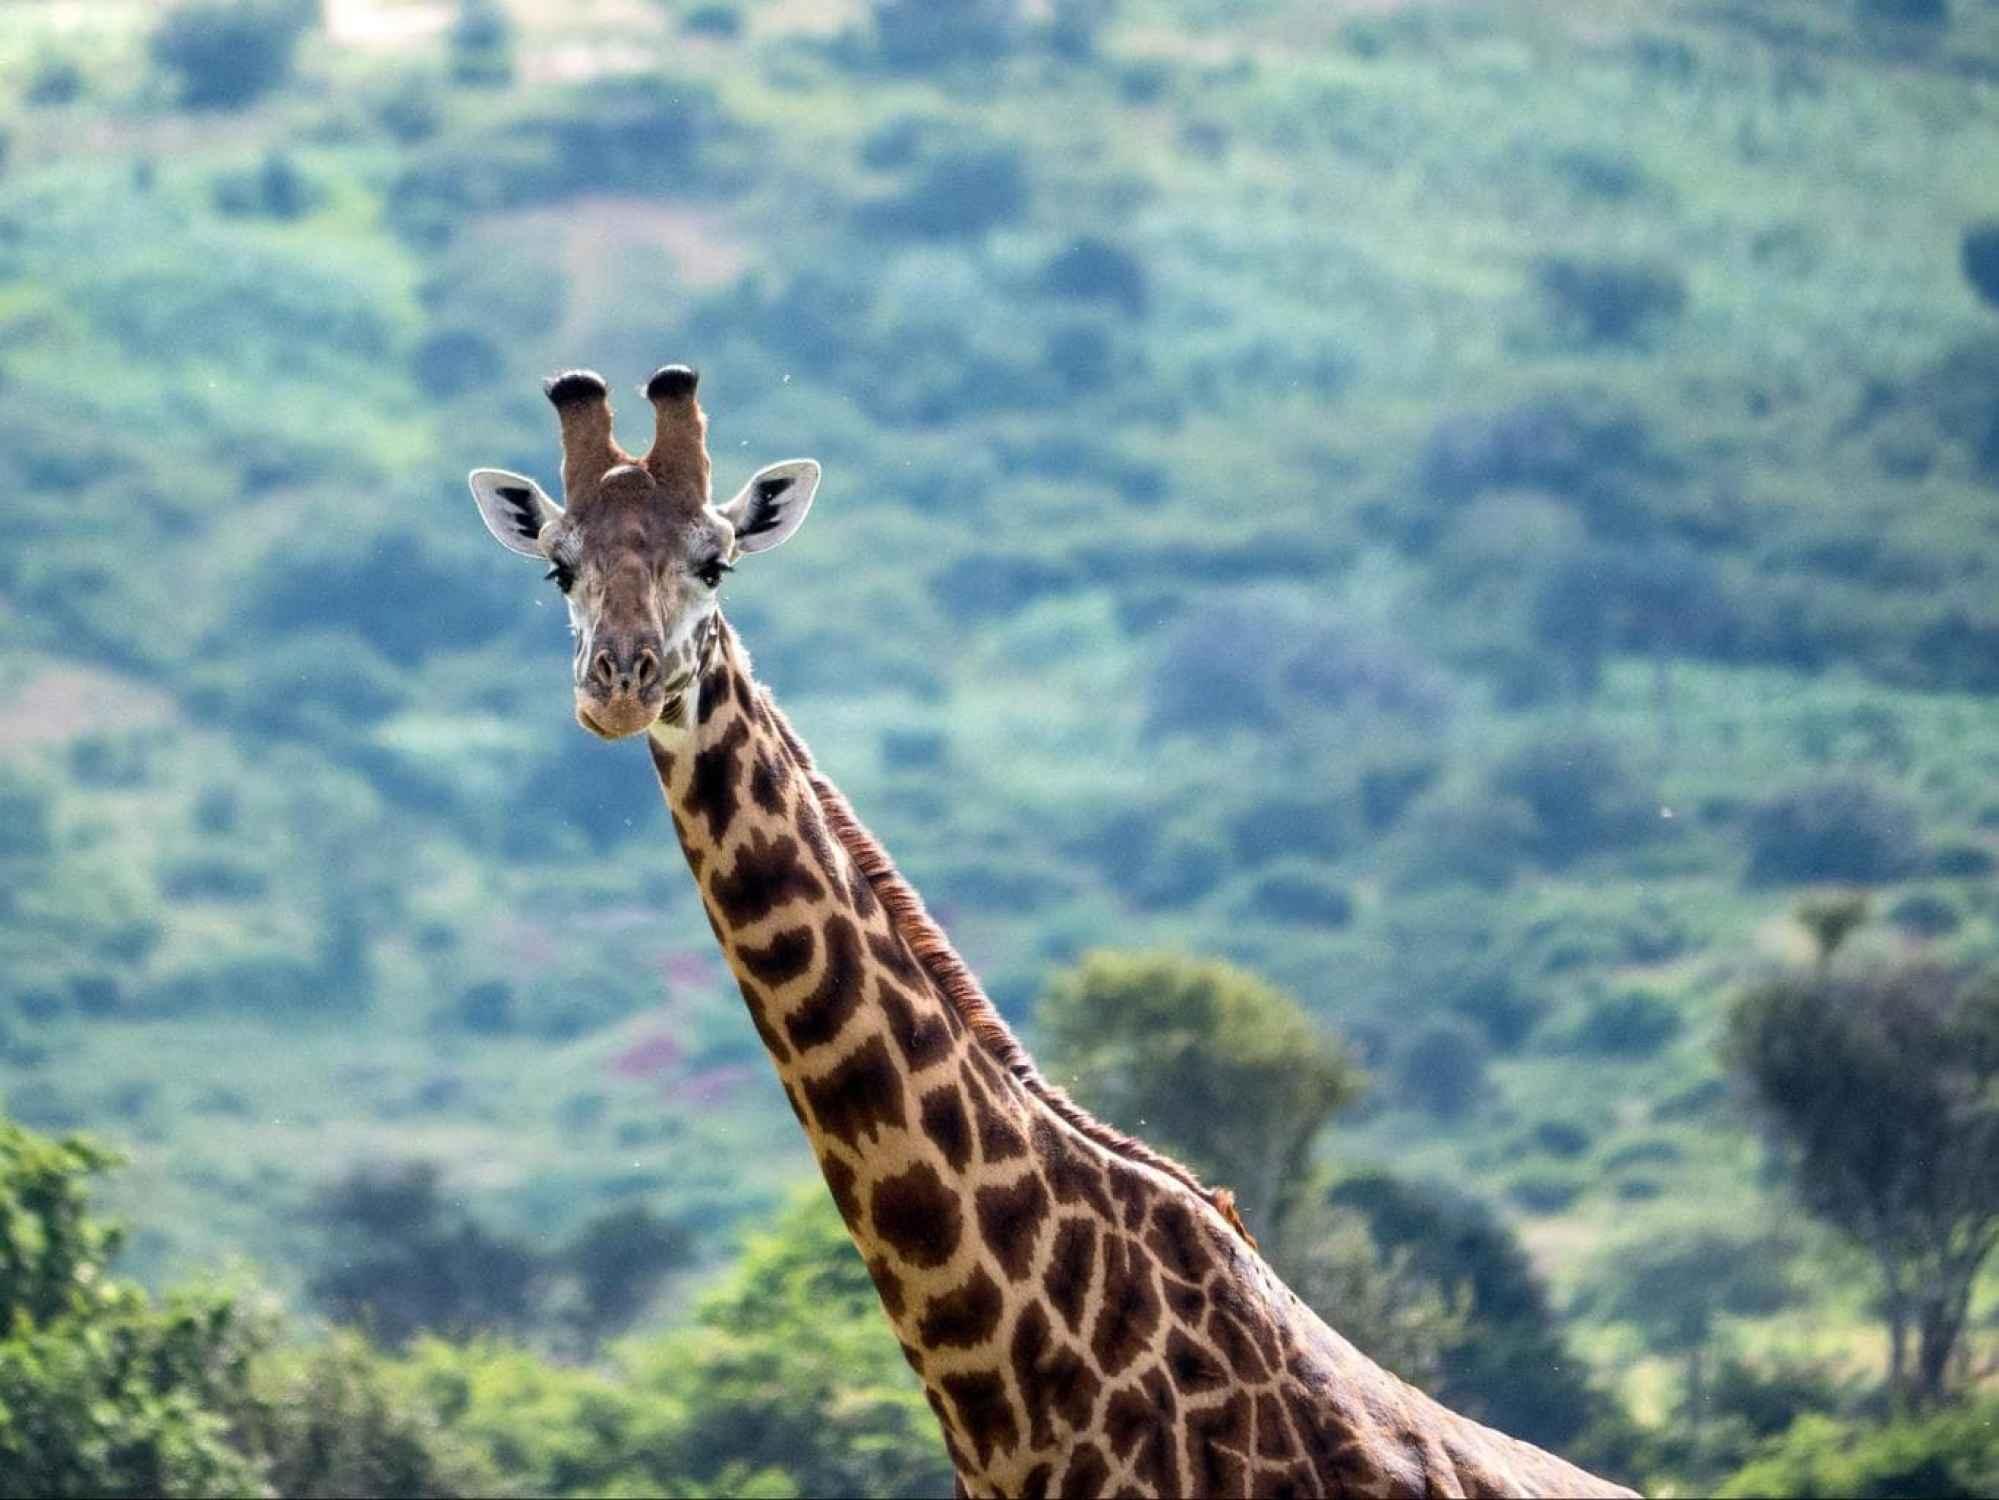 Giraffes areas of Akagera National Park